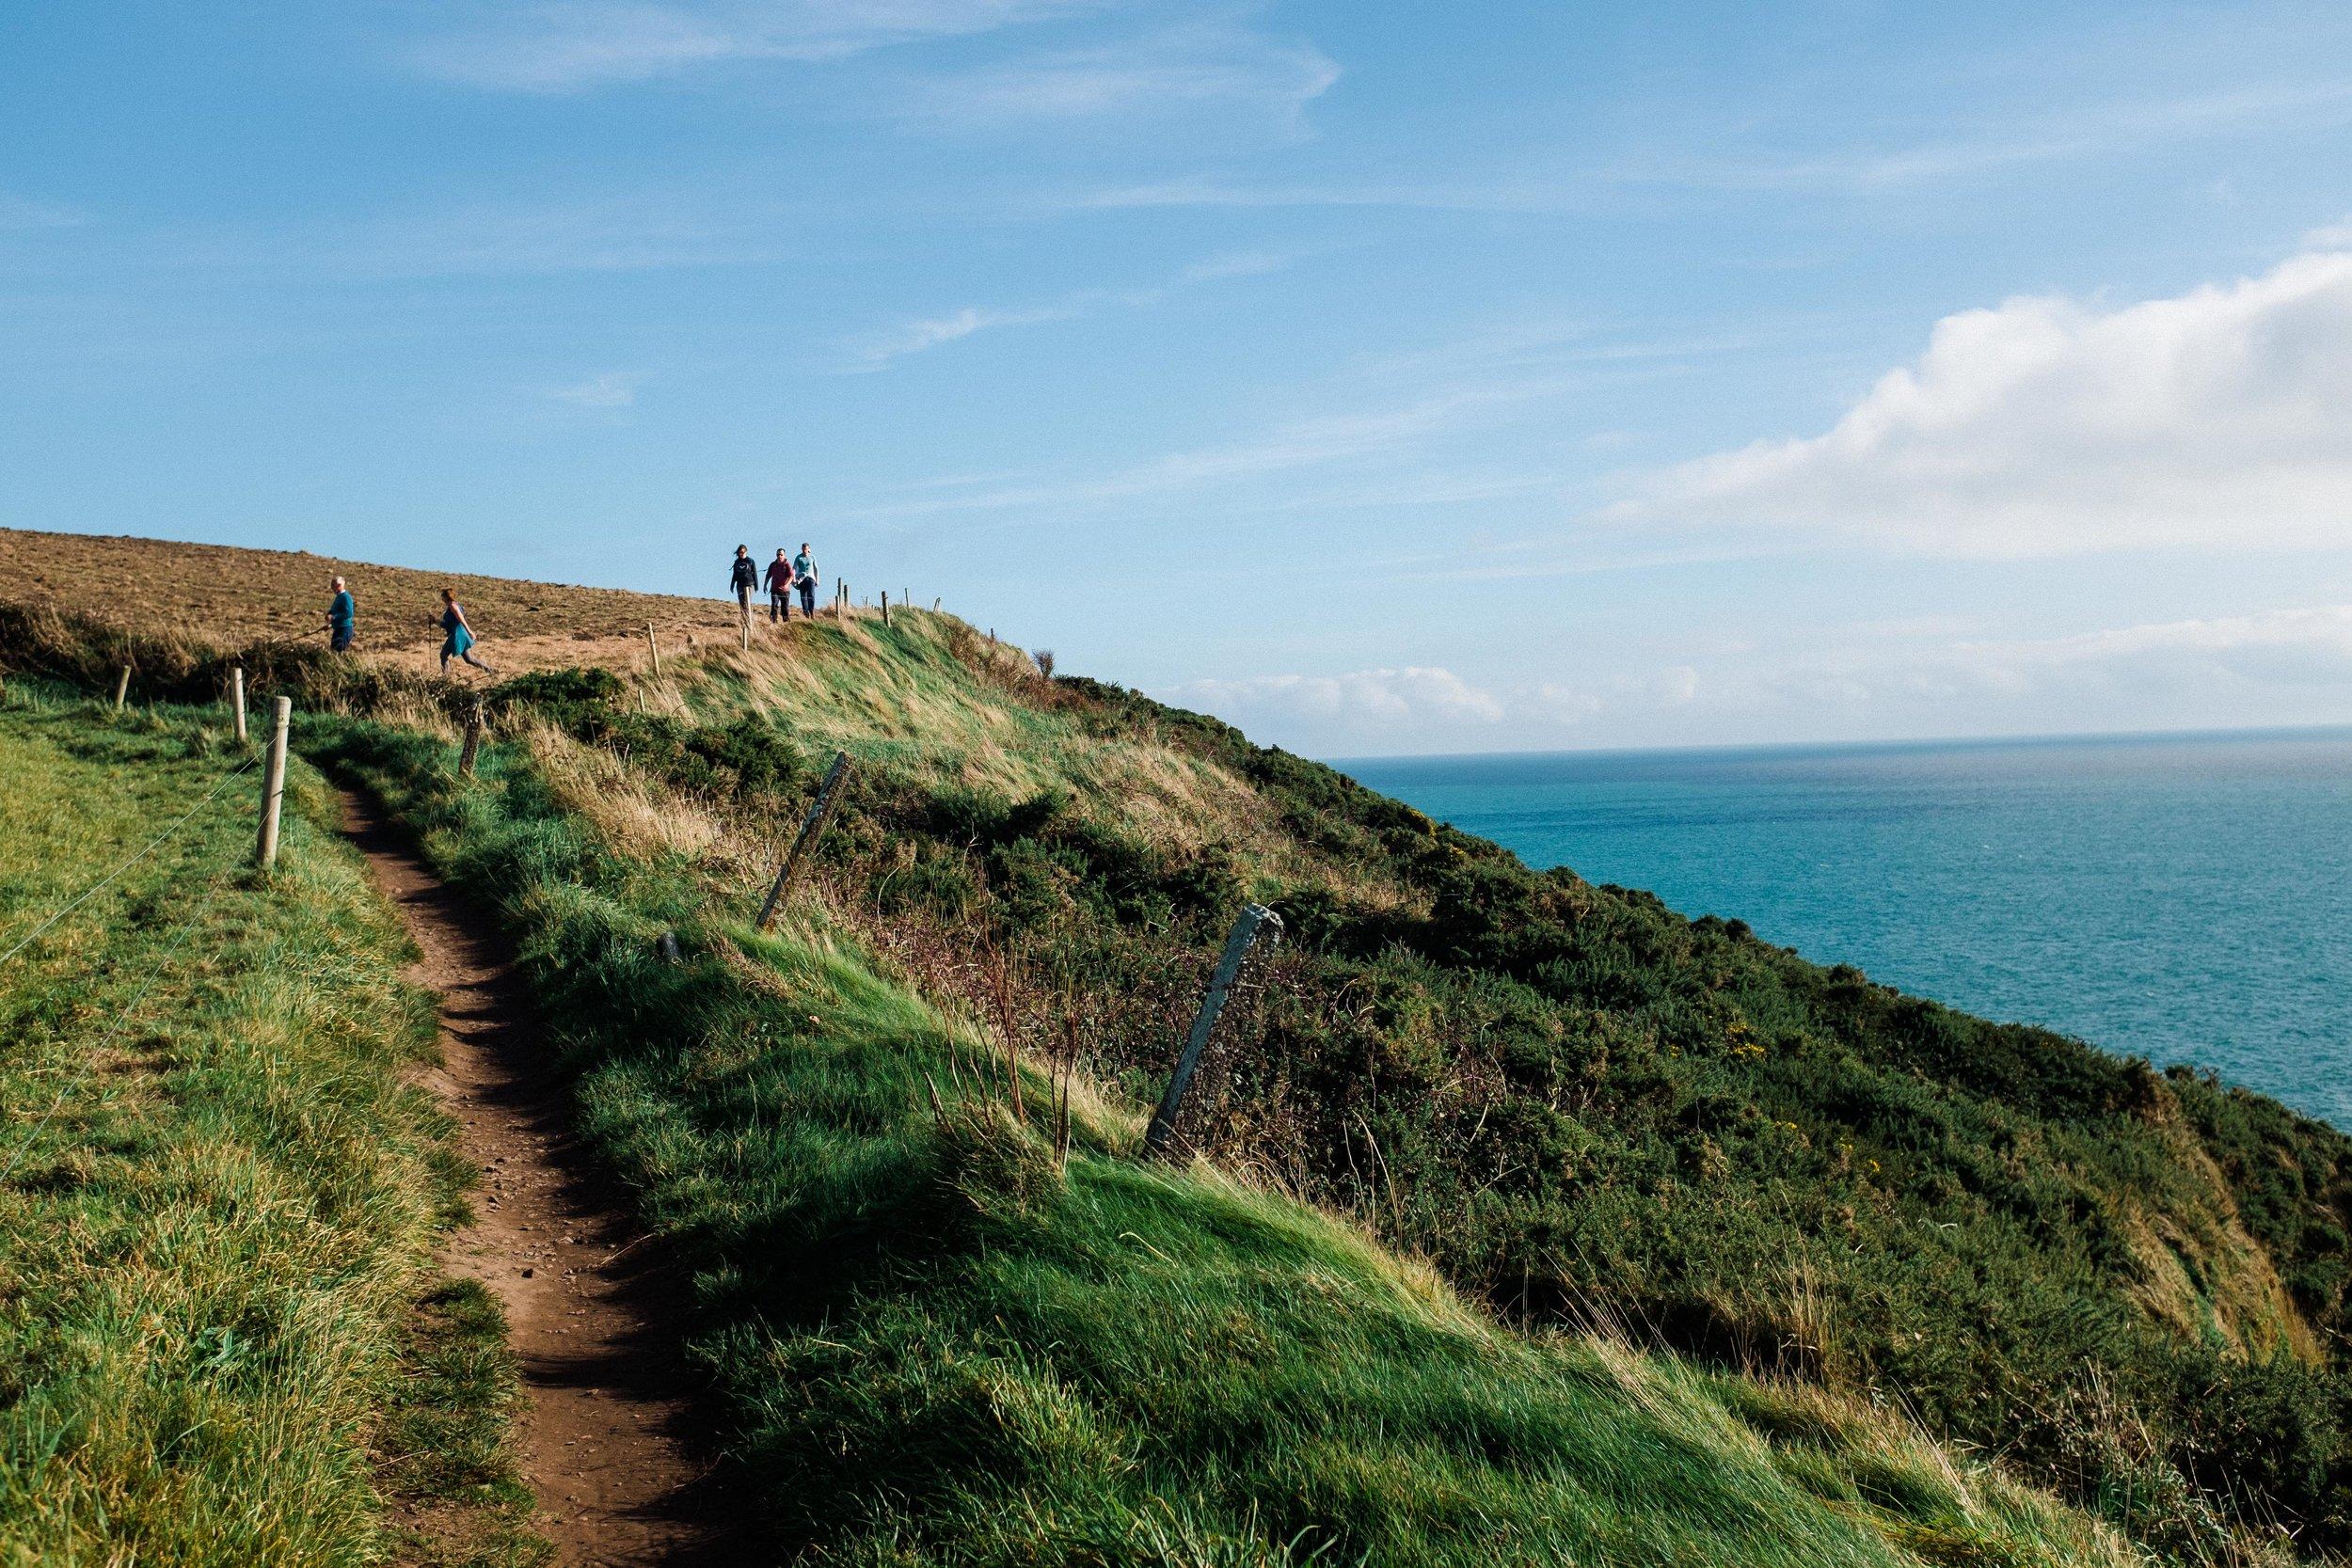 ballycotton-ireland-cliff-walk-5953.jpg